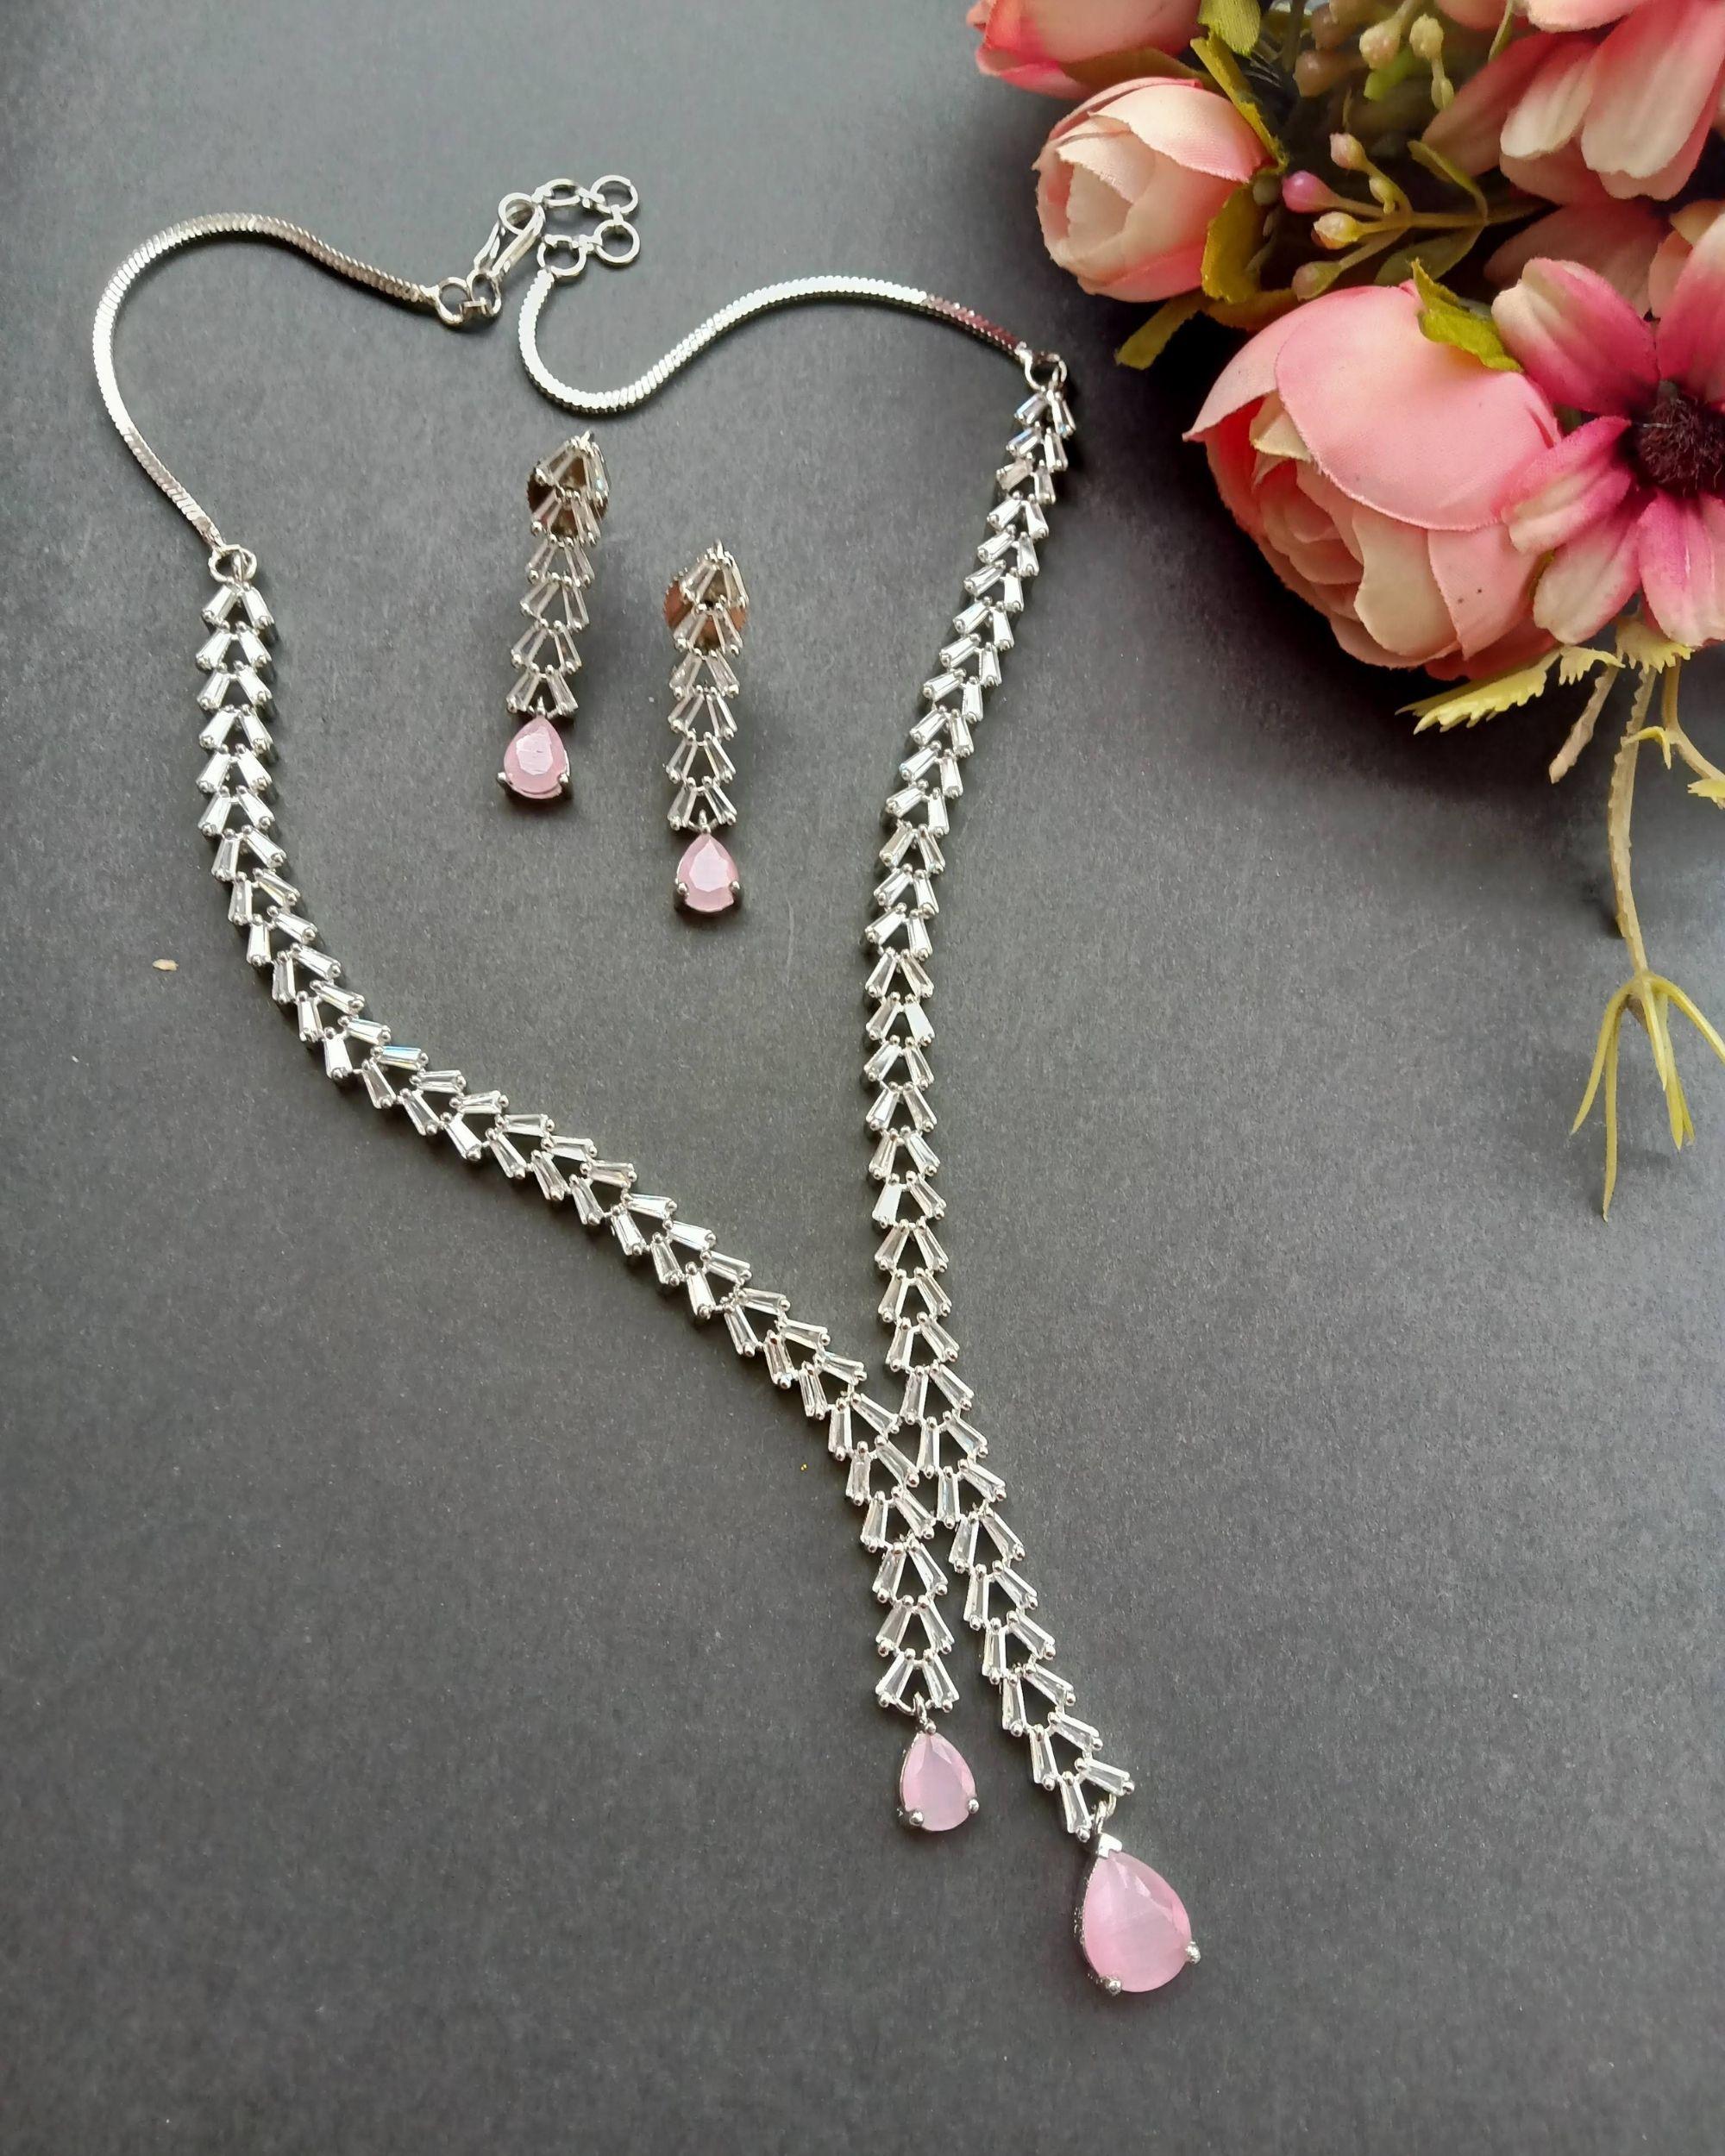 Pink quartz drop neckpiece with earrings - set of two